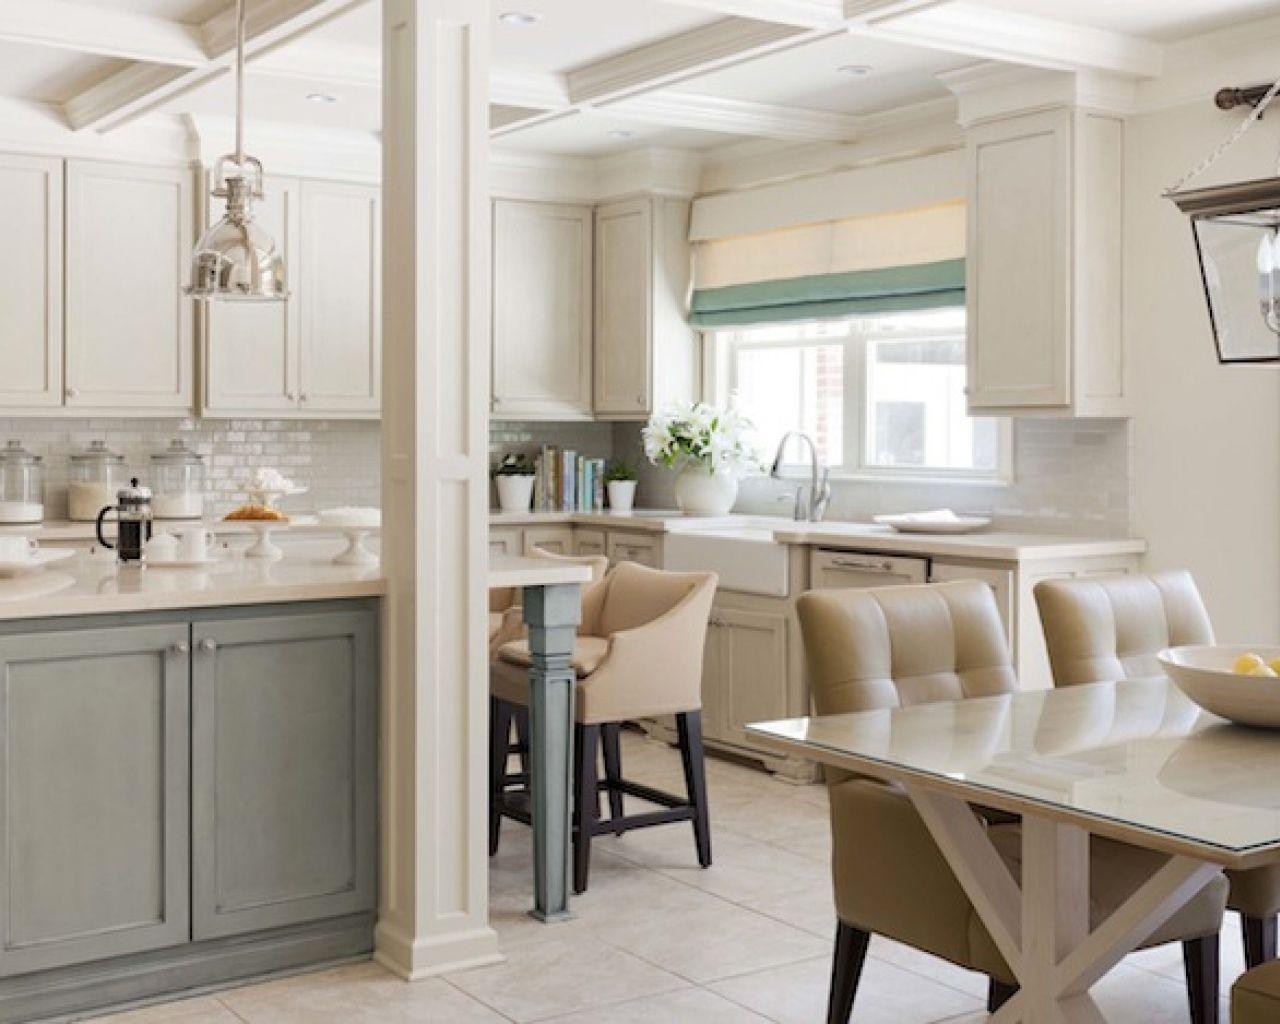 shaker kitchen cabinets gray kitchen ideas shaker cabinets Google Search